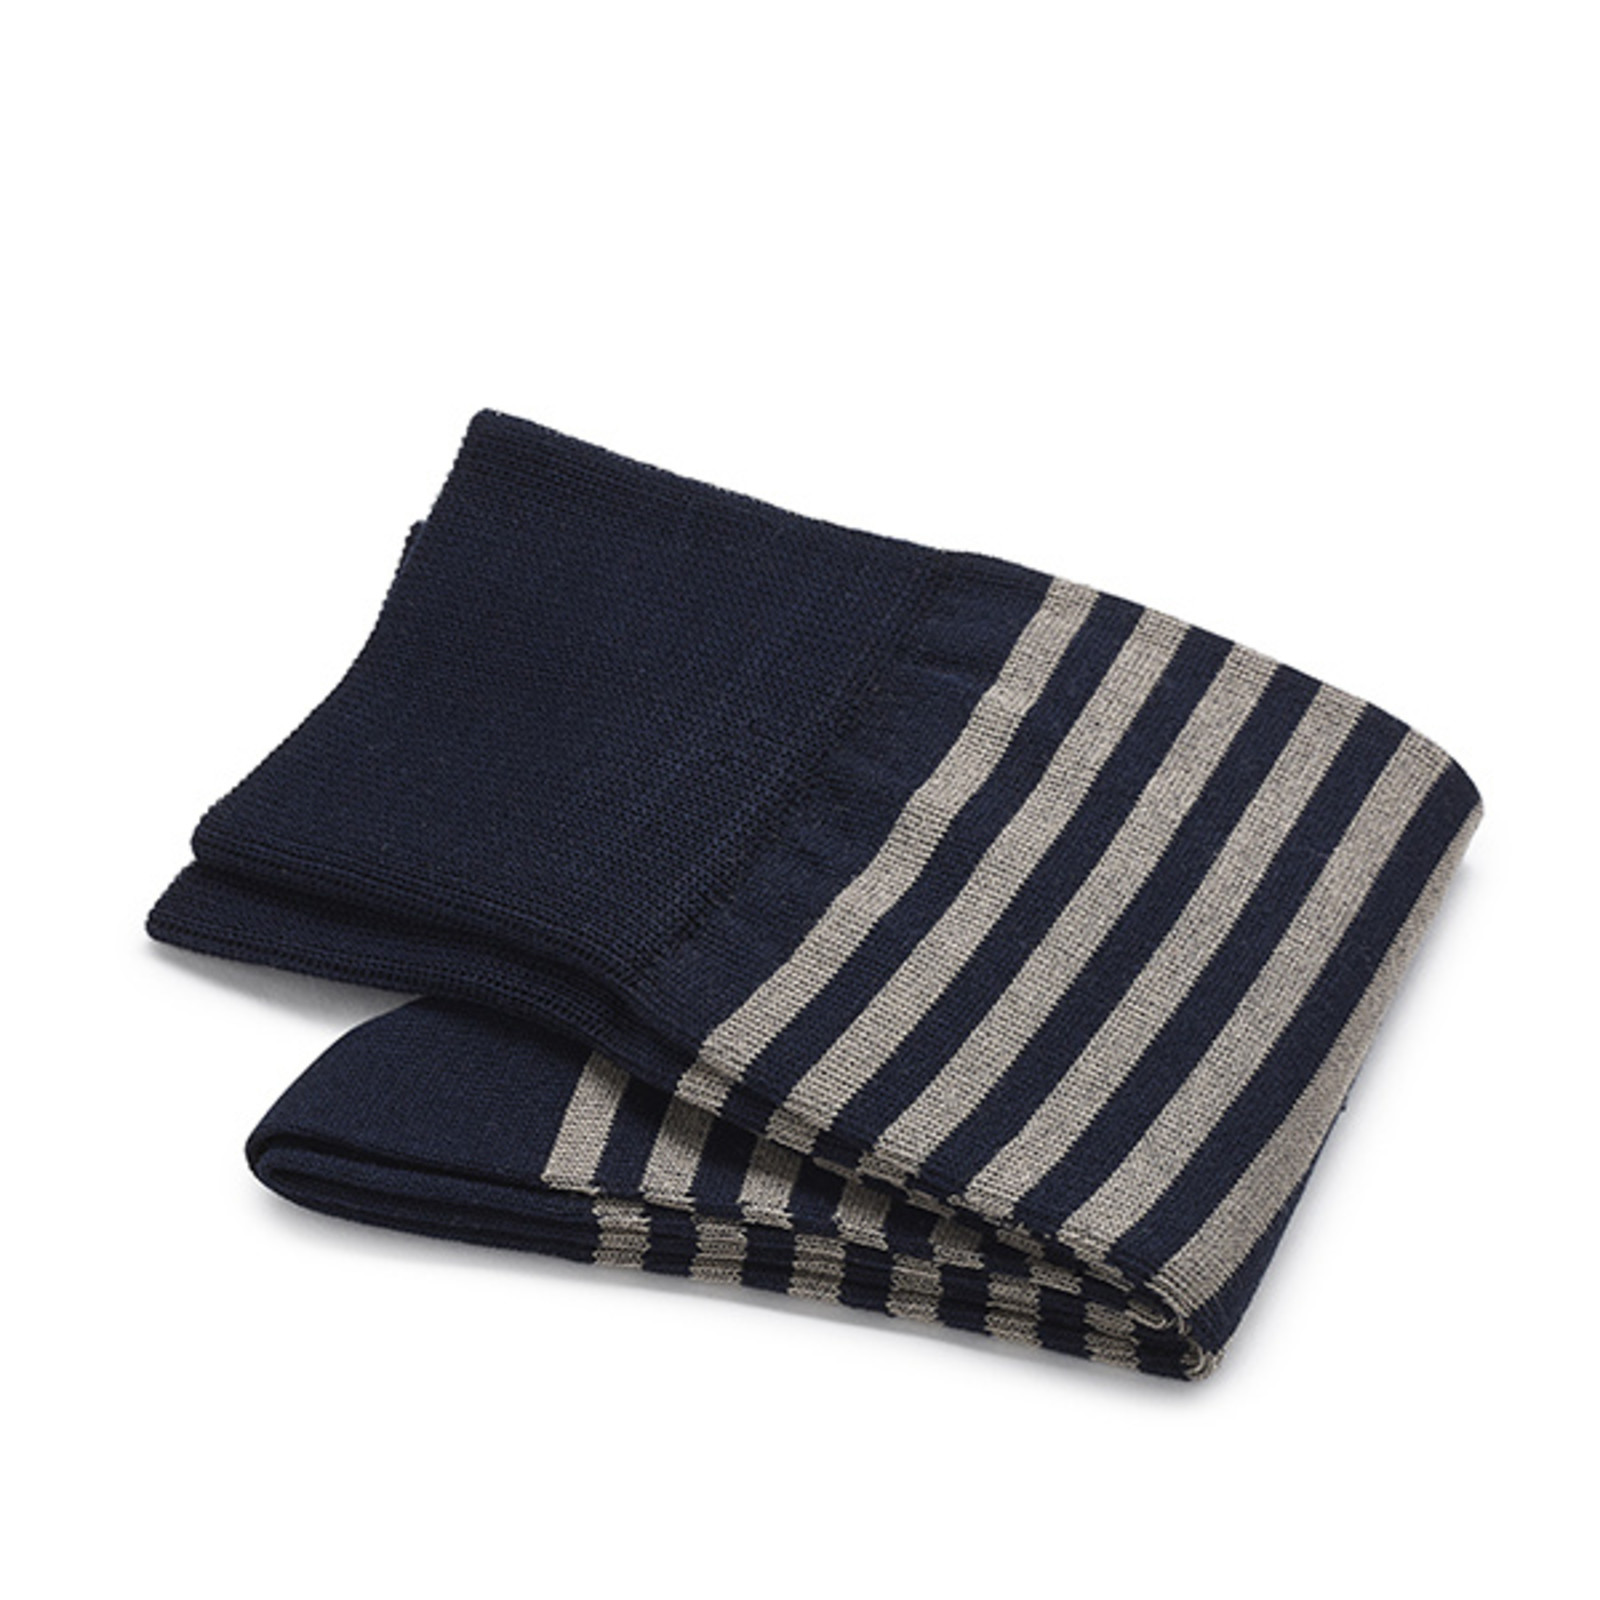 Carlo Lanza Giftpackage wine & socks